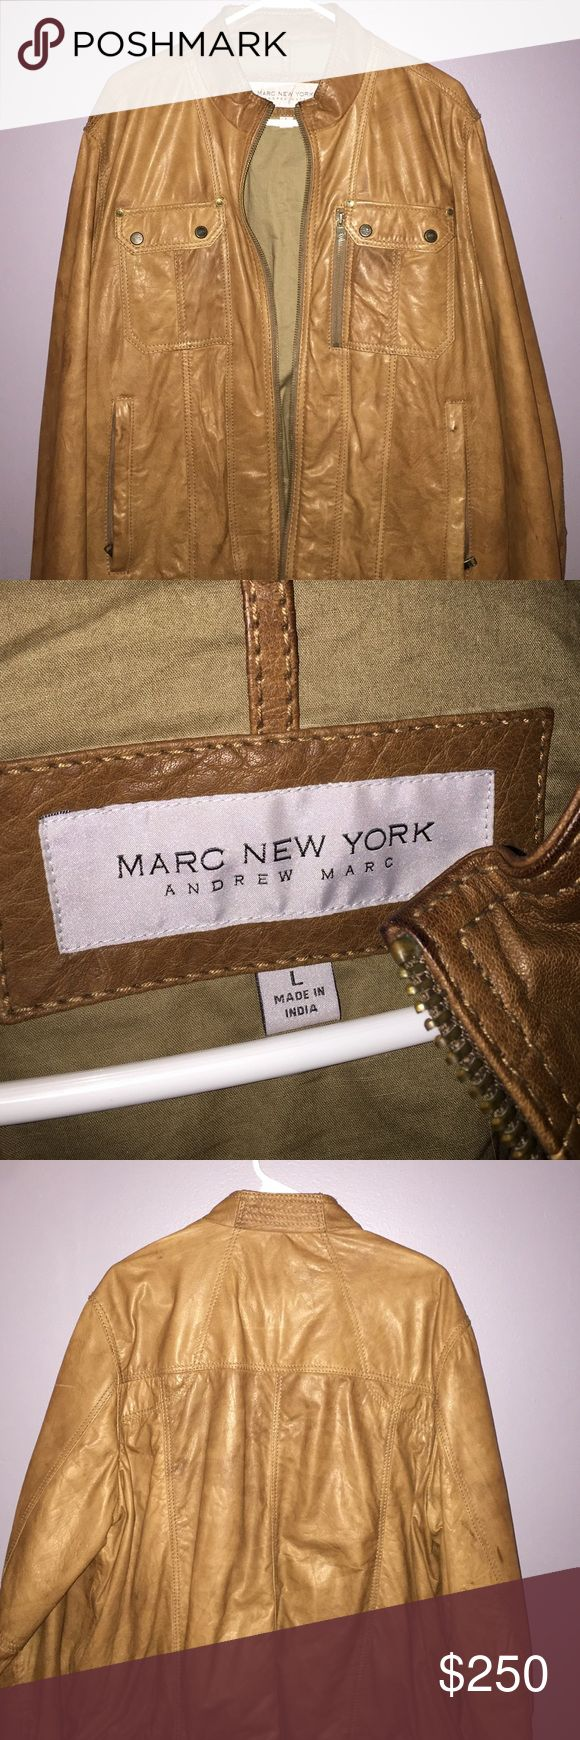 Andrew Marc tan leather jacket mens L Tan leather jacket by Andrew Marc, 100% real leather, never worn! Andrew Marc Jackets & Coats